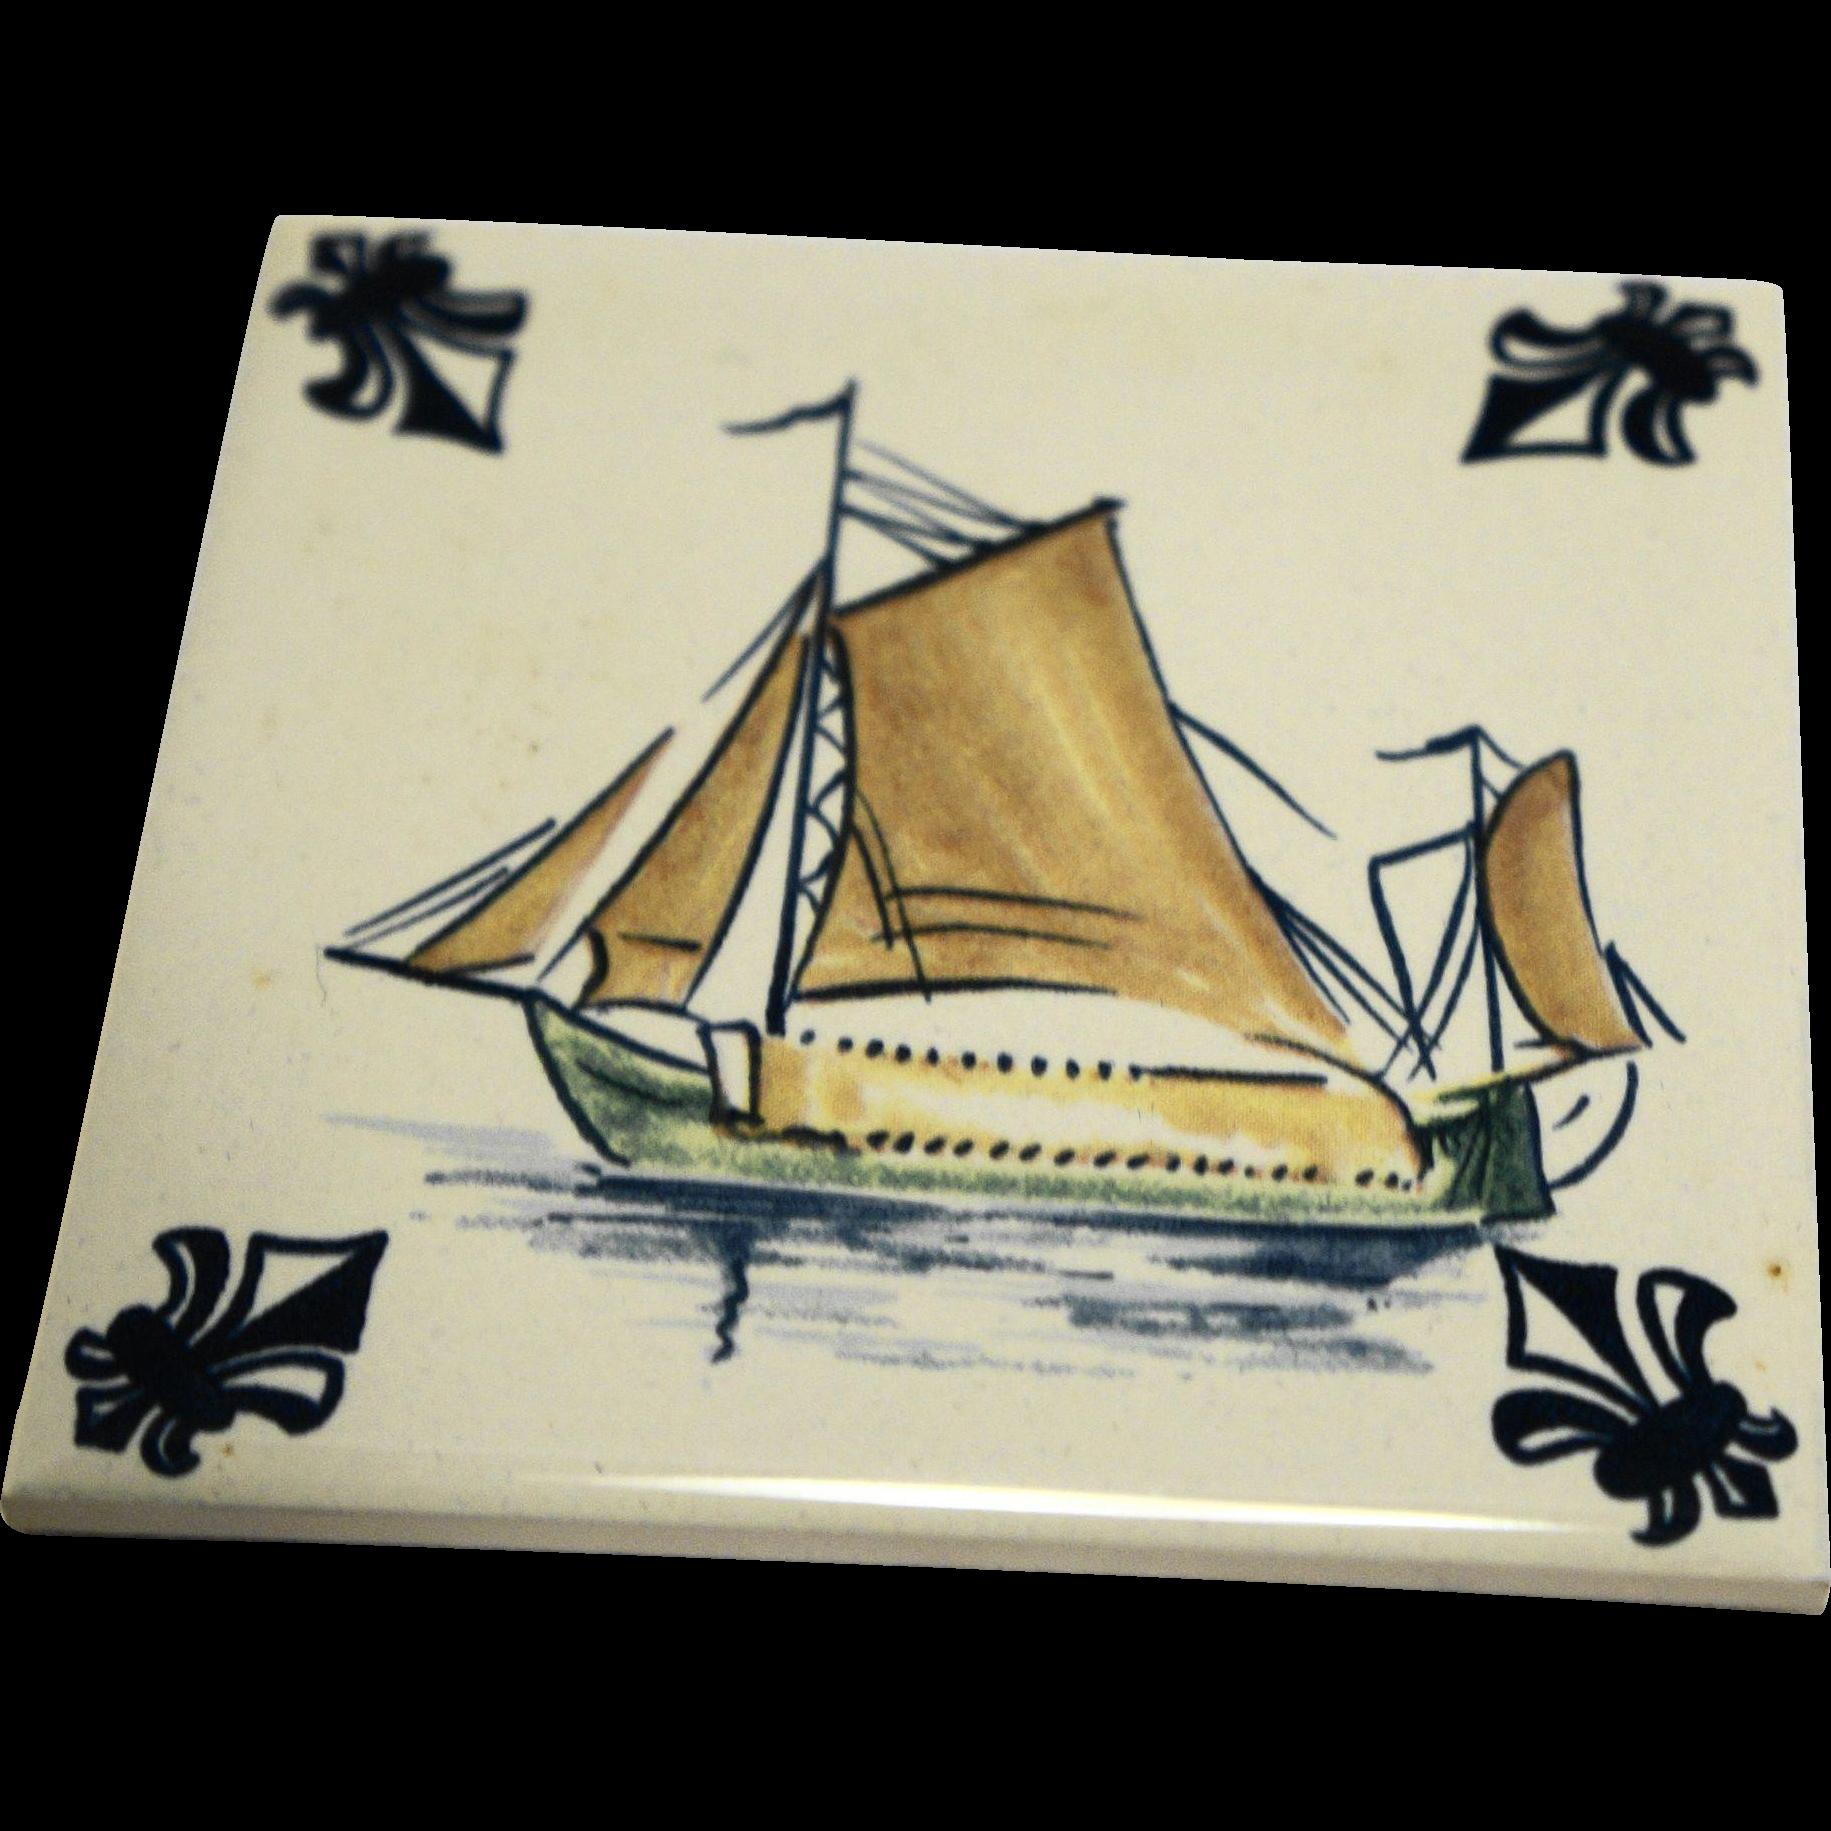 KLM Polychrome Delft Ship Series Tile Coaster C5 Hay Barge